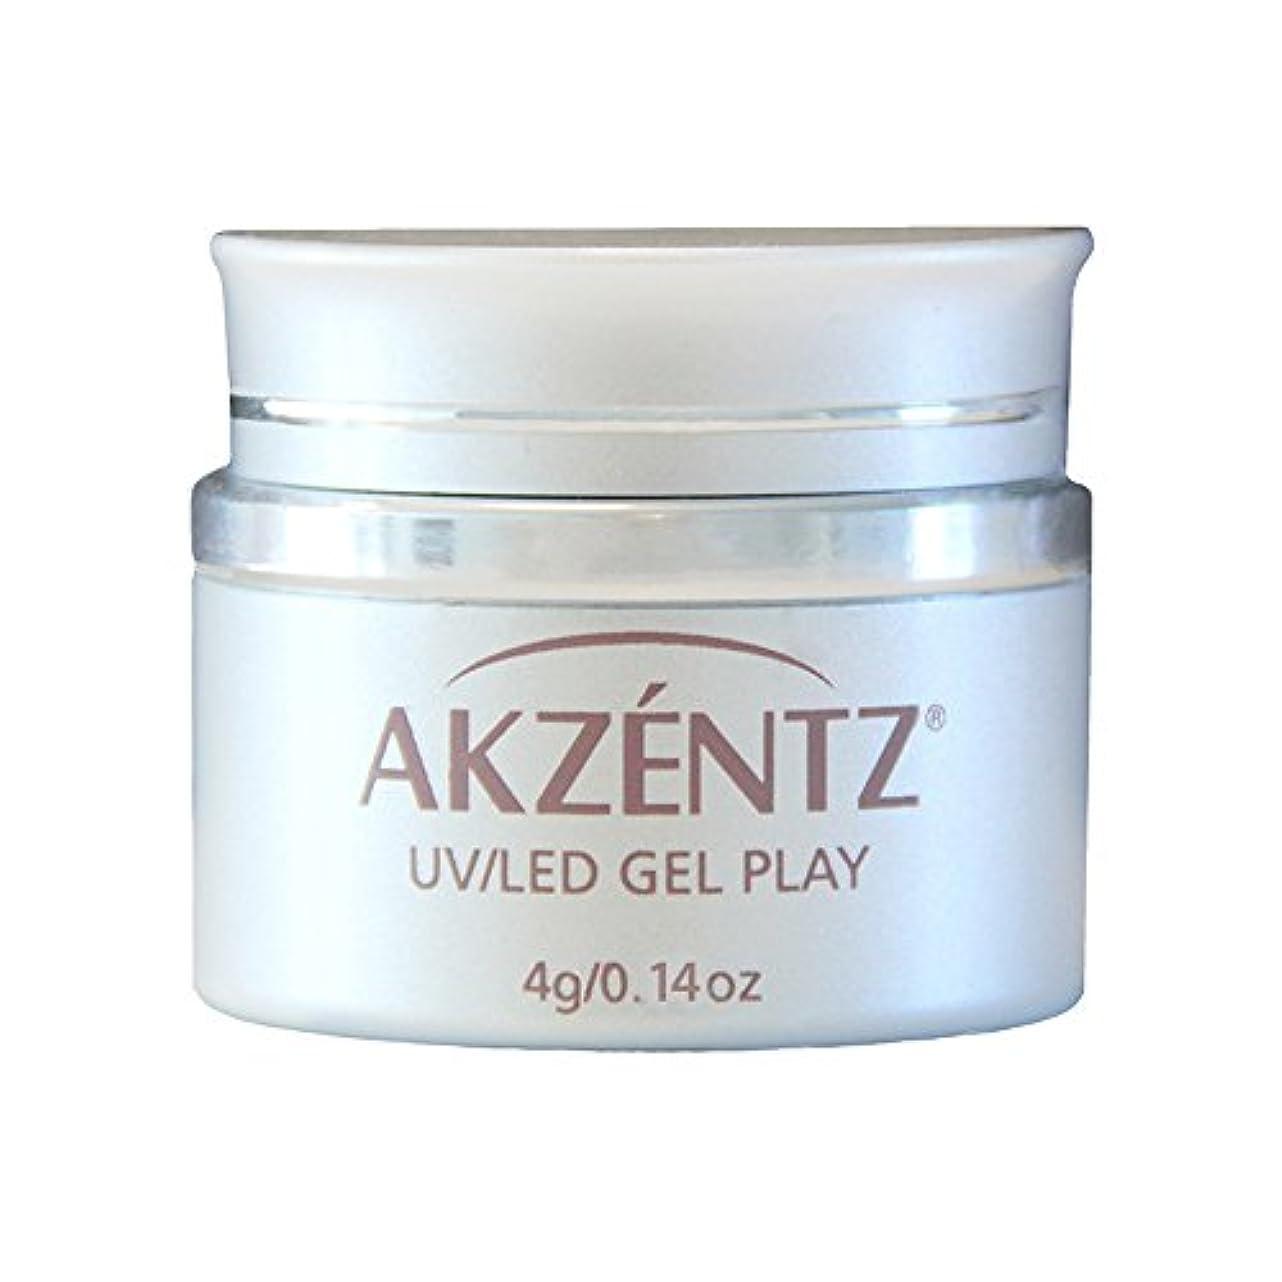 AKZENTZ カラージェル ジェルプレイ ペイントオレンジ 4g UV/LED対応